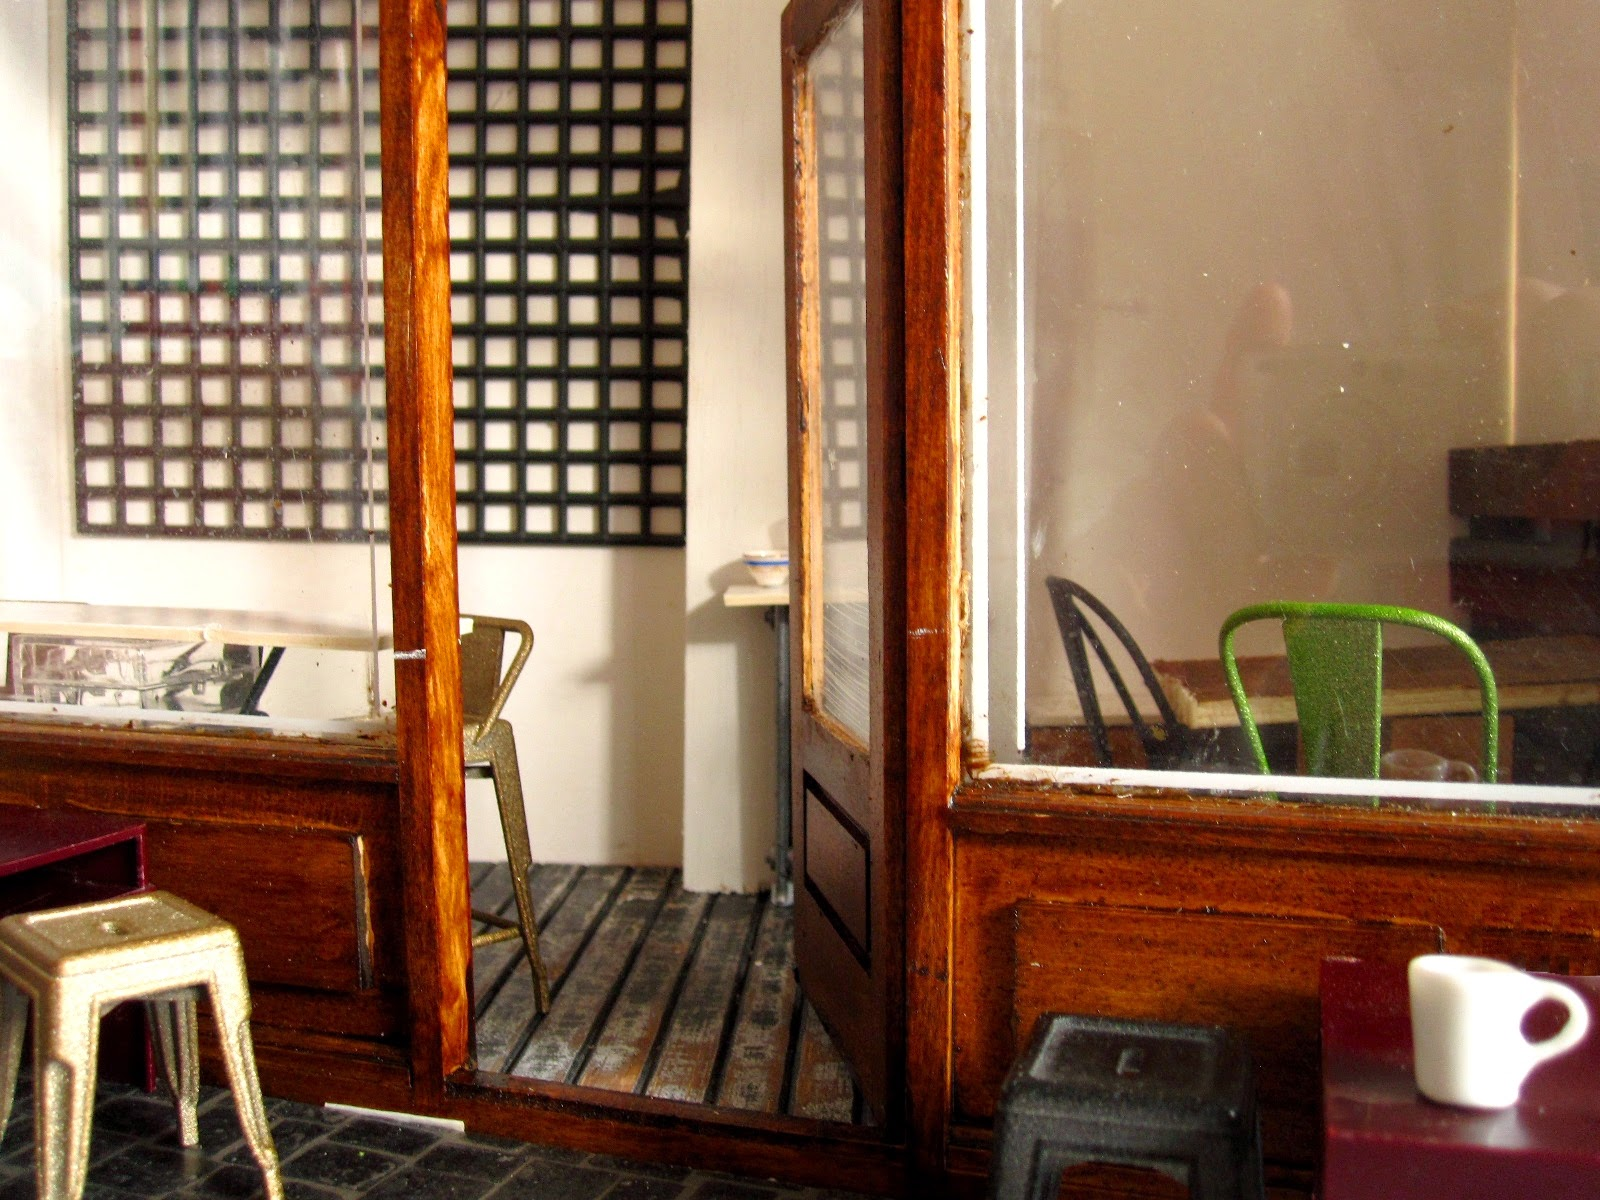 Modern dolls' house half-built miniature cafe scene.